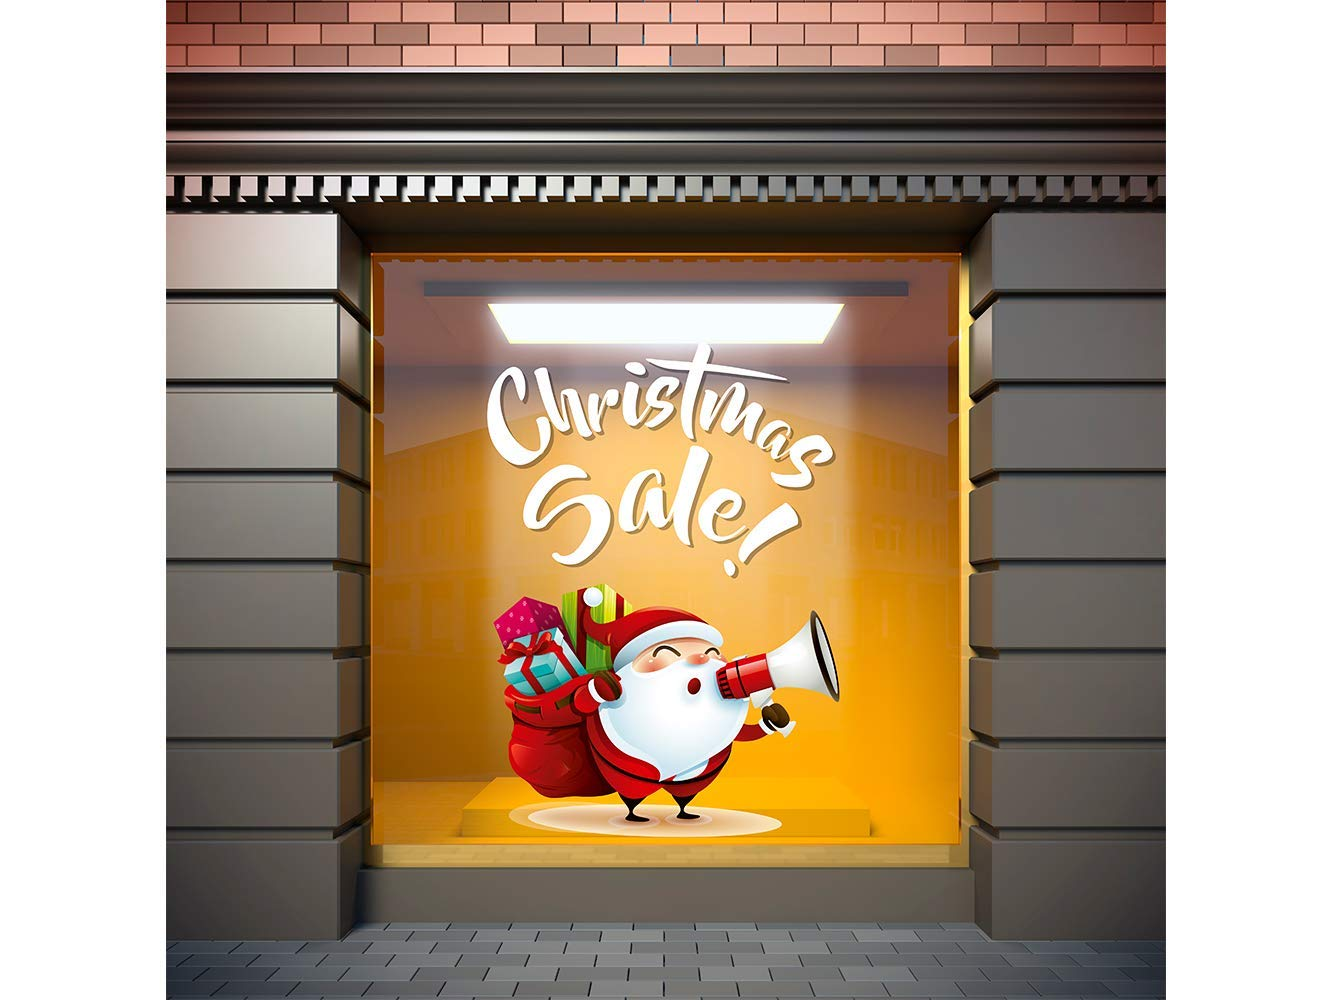 Vinilo Navidad Christmas Sale | Carteles XXL - Impresión carteleria publicitaria